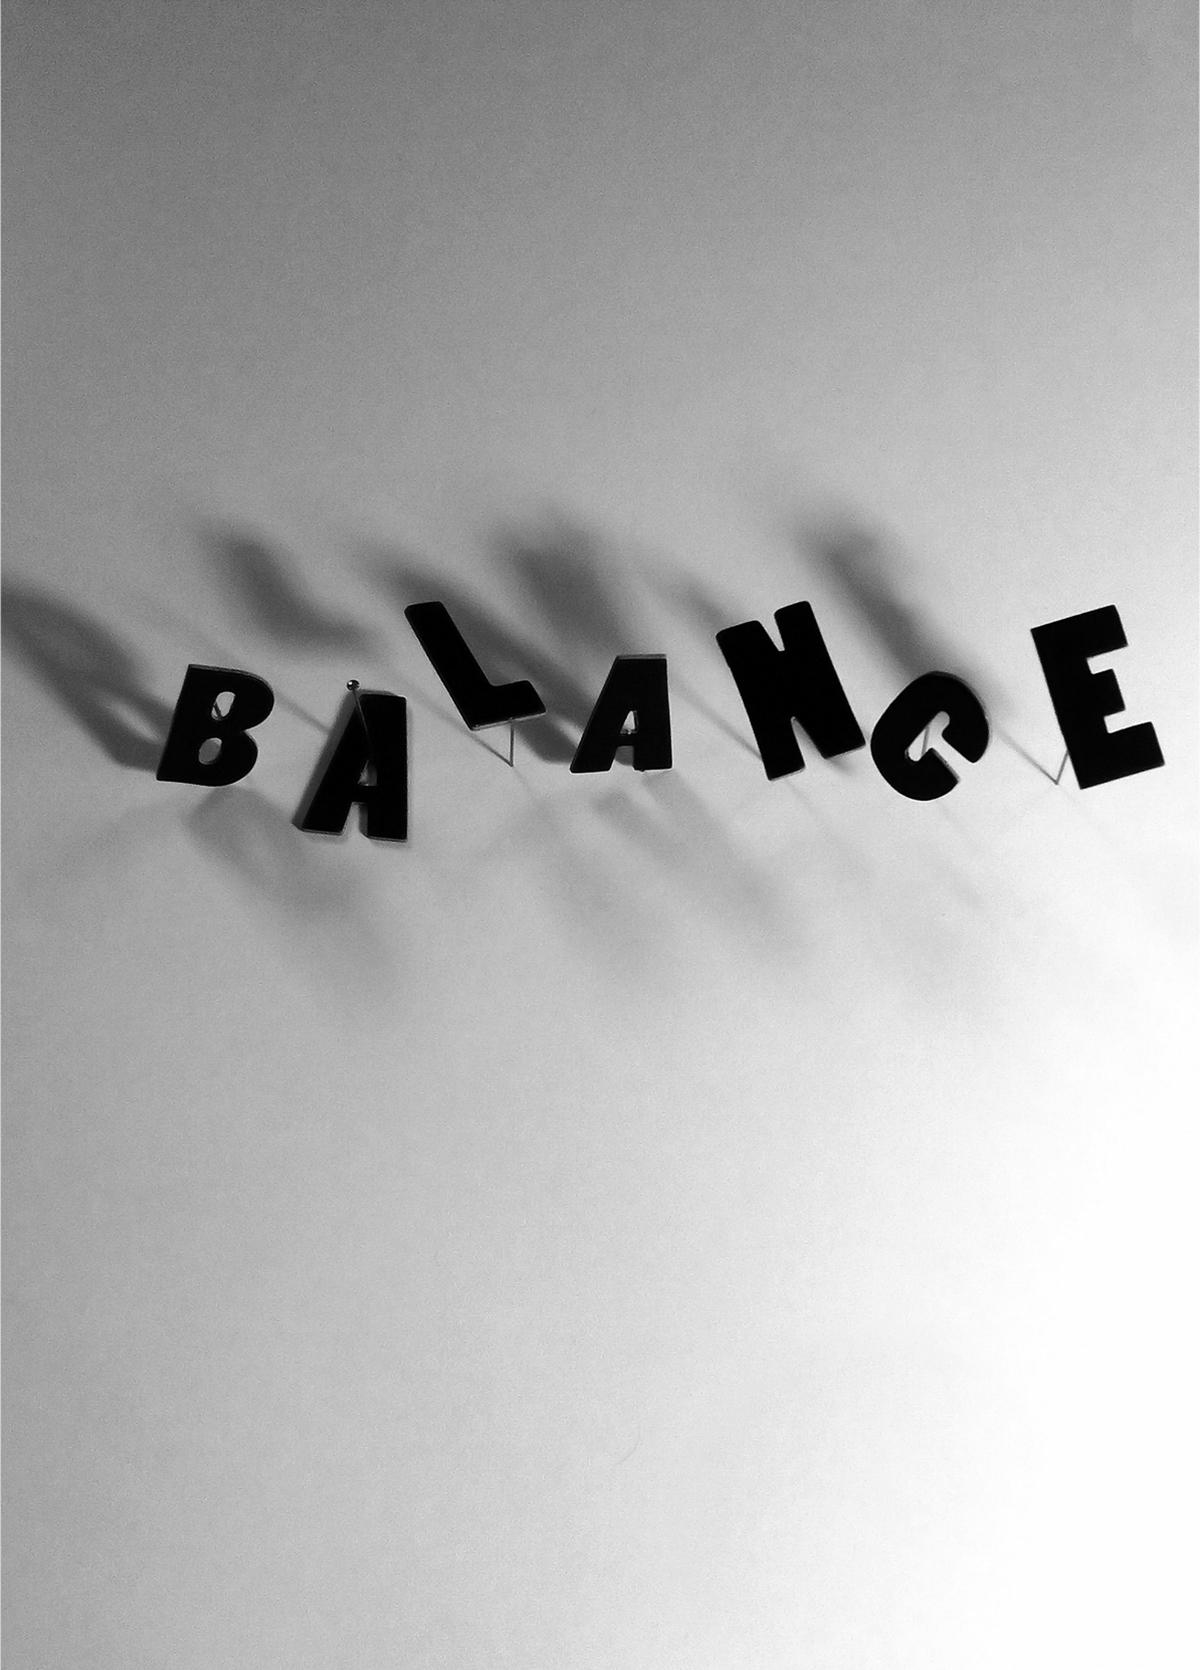 jeannettewiley_balance.jpg